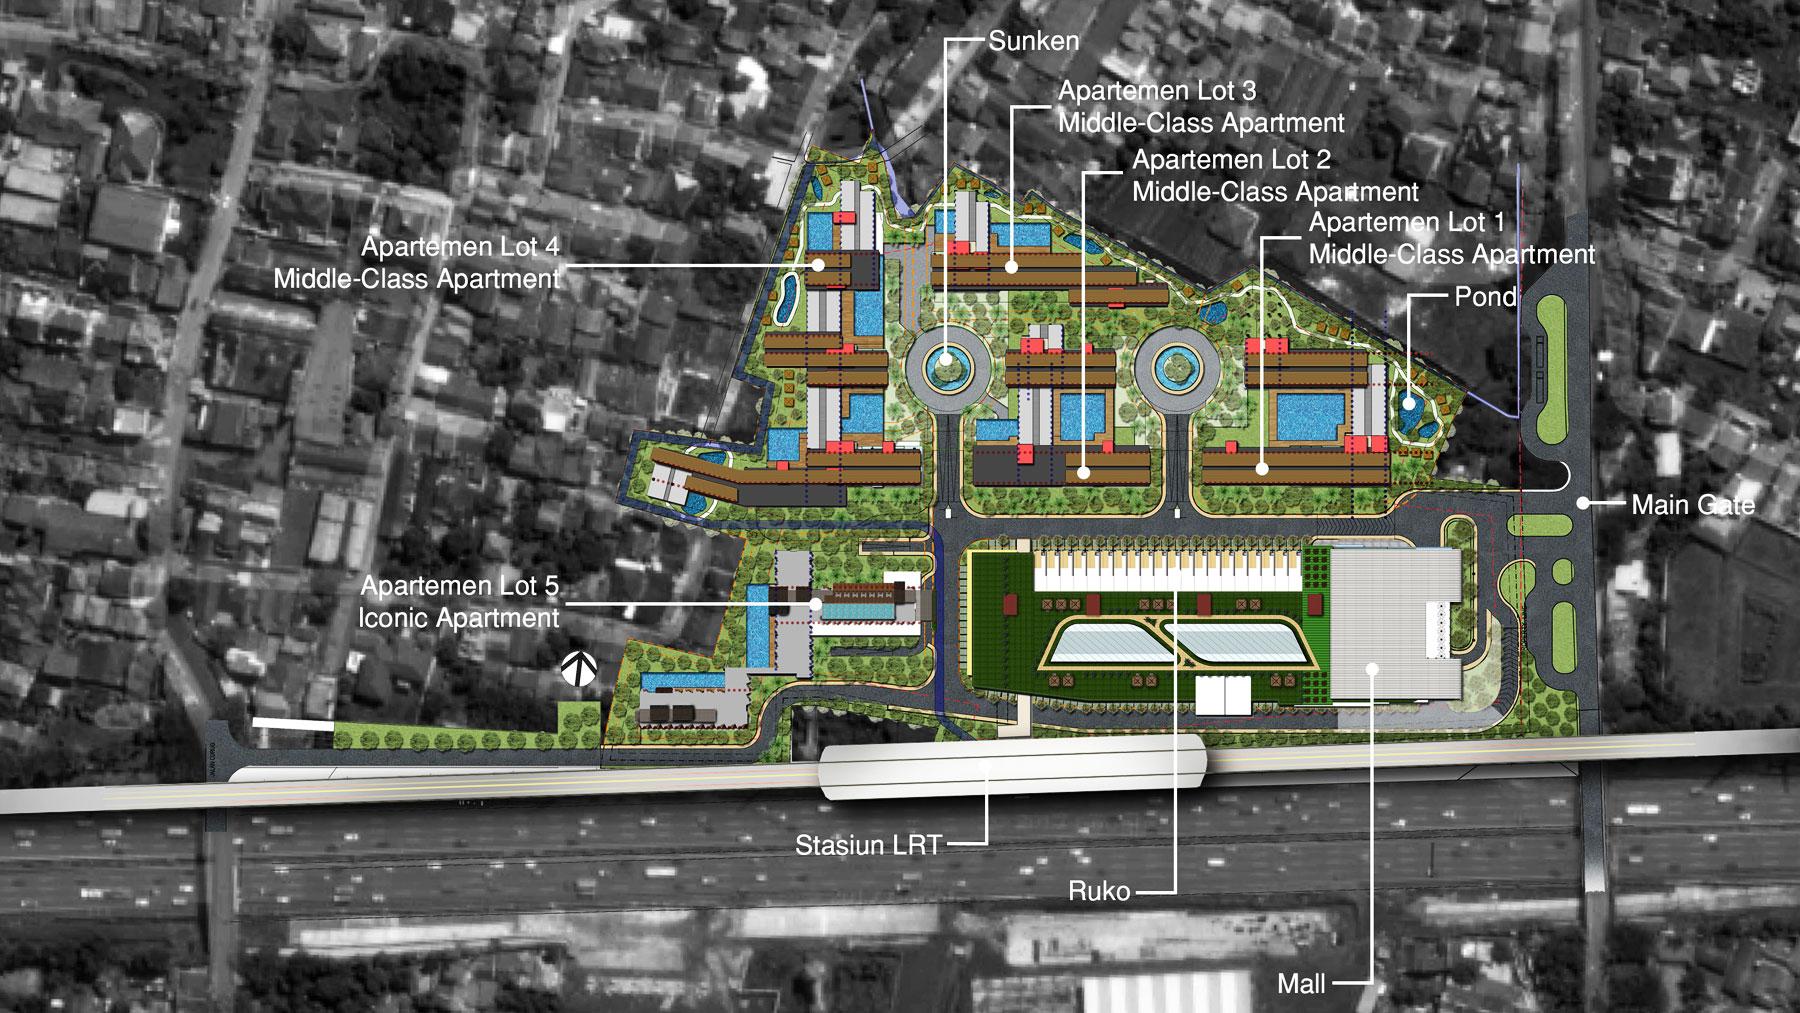 Lrt City Gateway 99 Co Indonesia